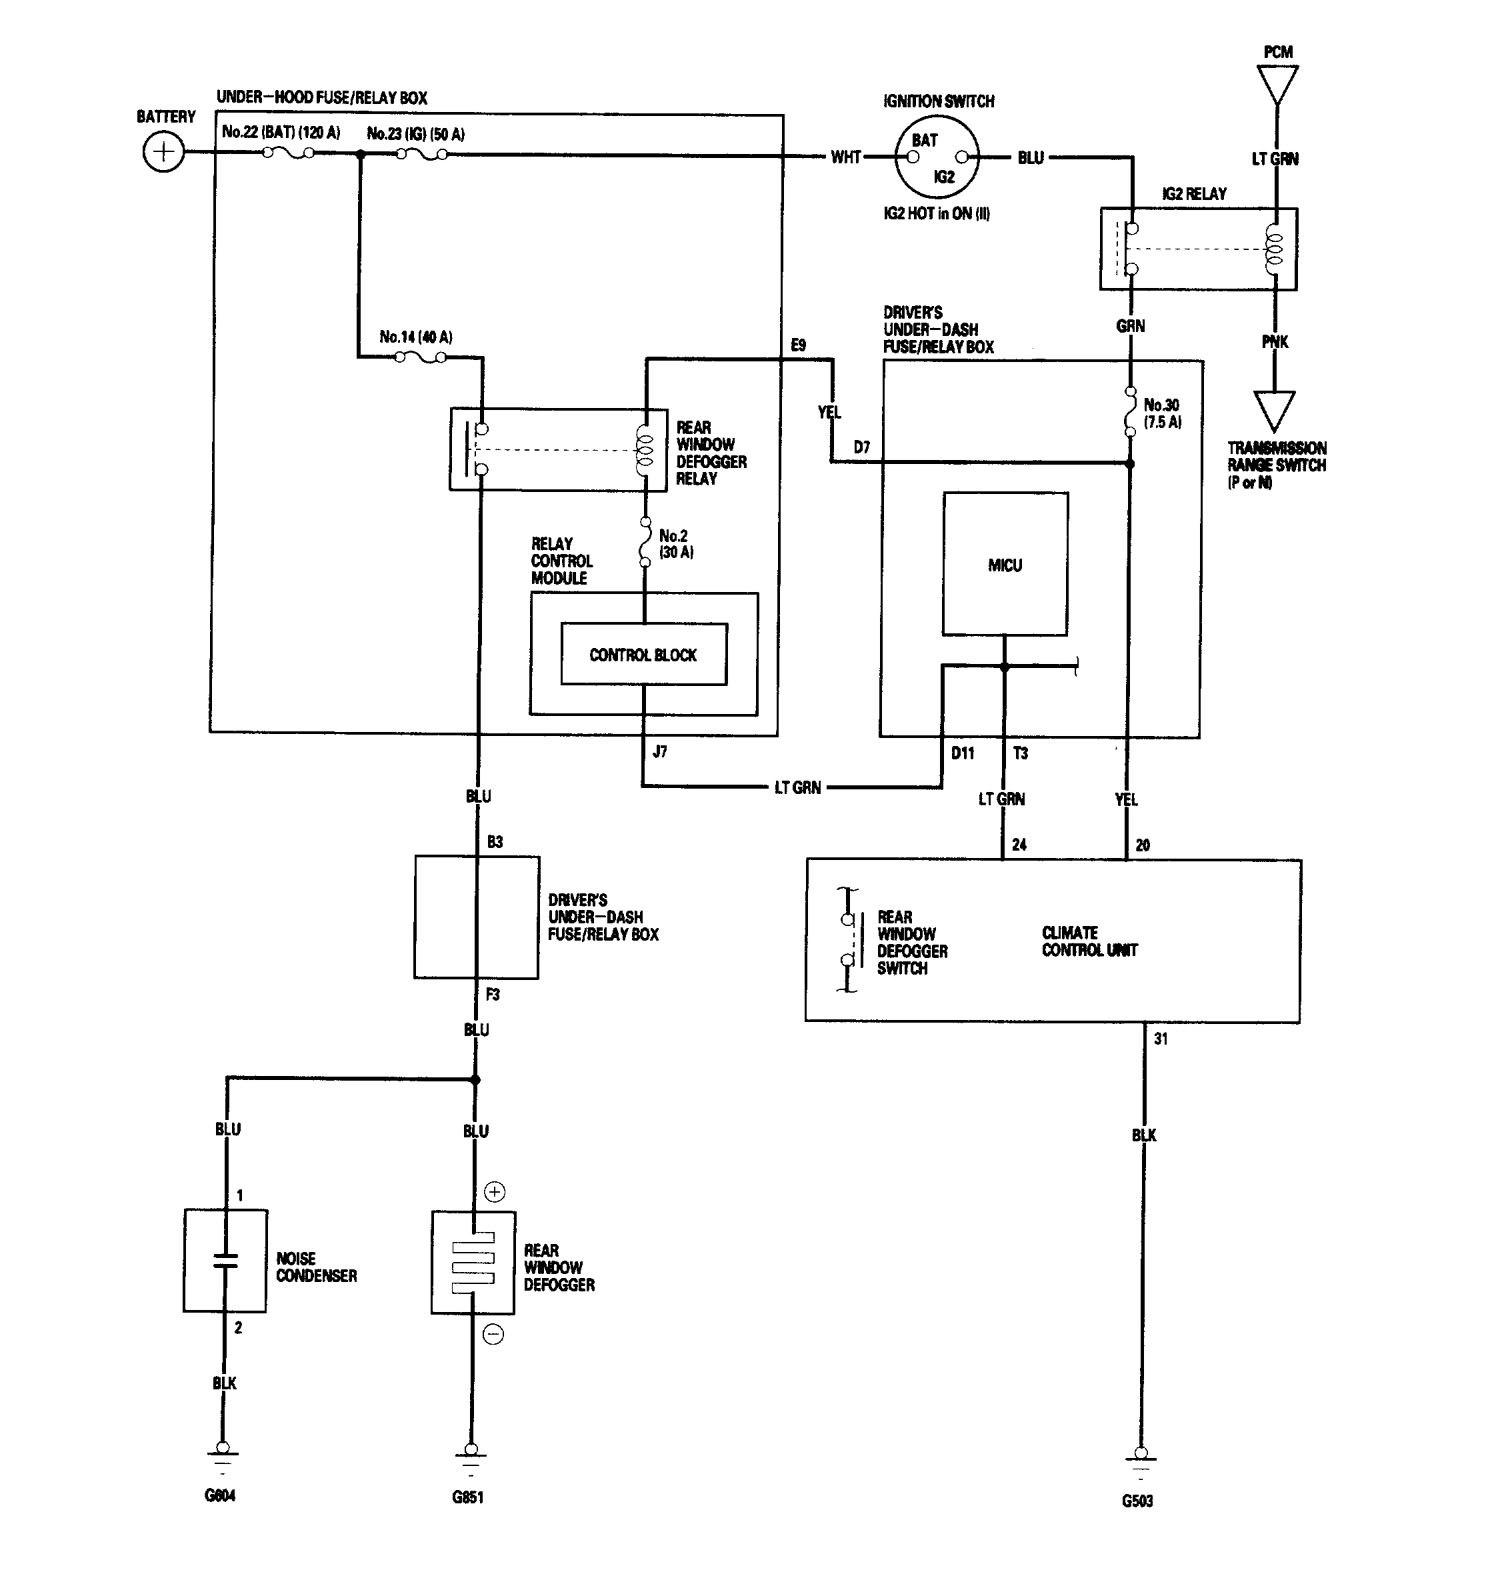 acura rl  2006  - wiring diagrams - rear window defogger